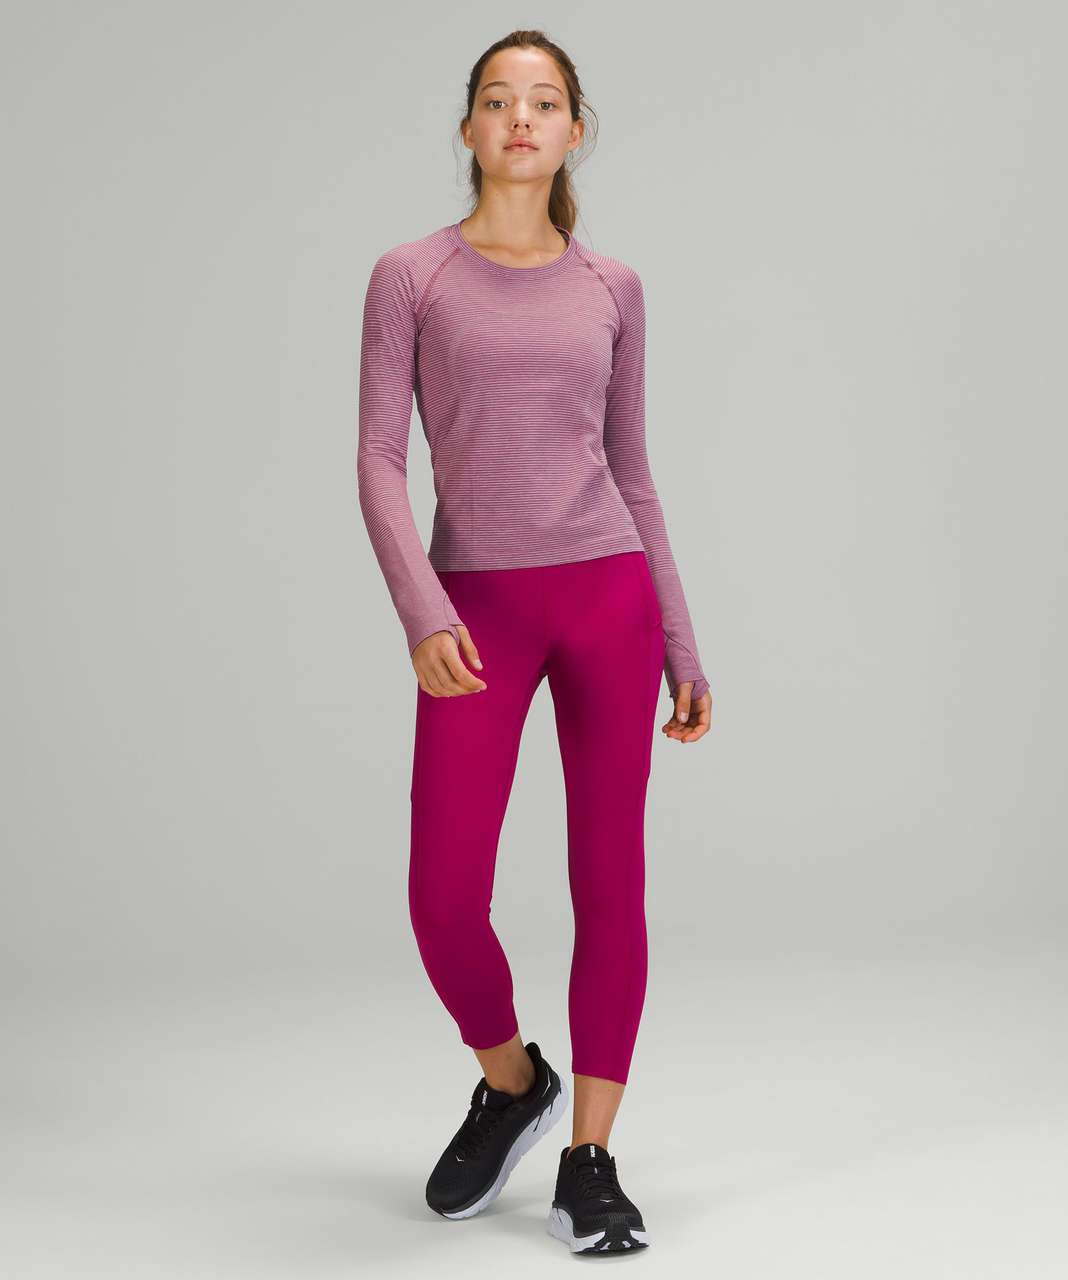 Lululemon Swiftly Tech Long Sleeve Shirt 2.0 *Race Length - Tetra Stripe Rhino Grey / Ripened Raspberry / Pink Blossom / Pink Lychee